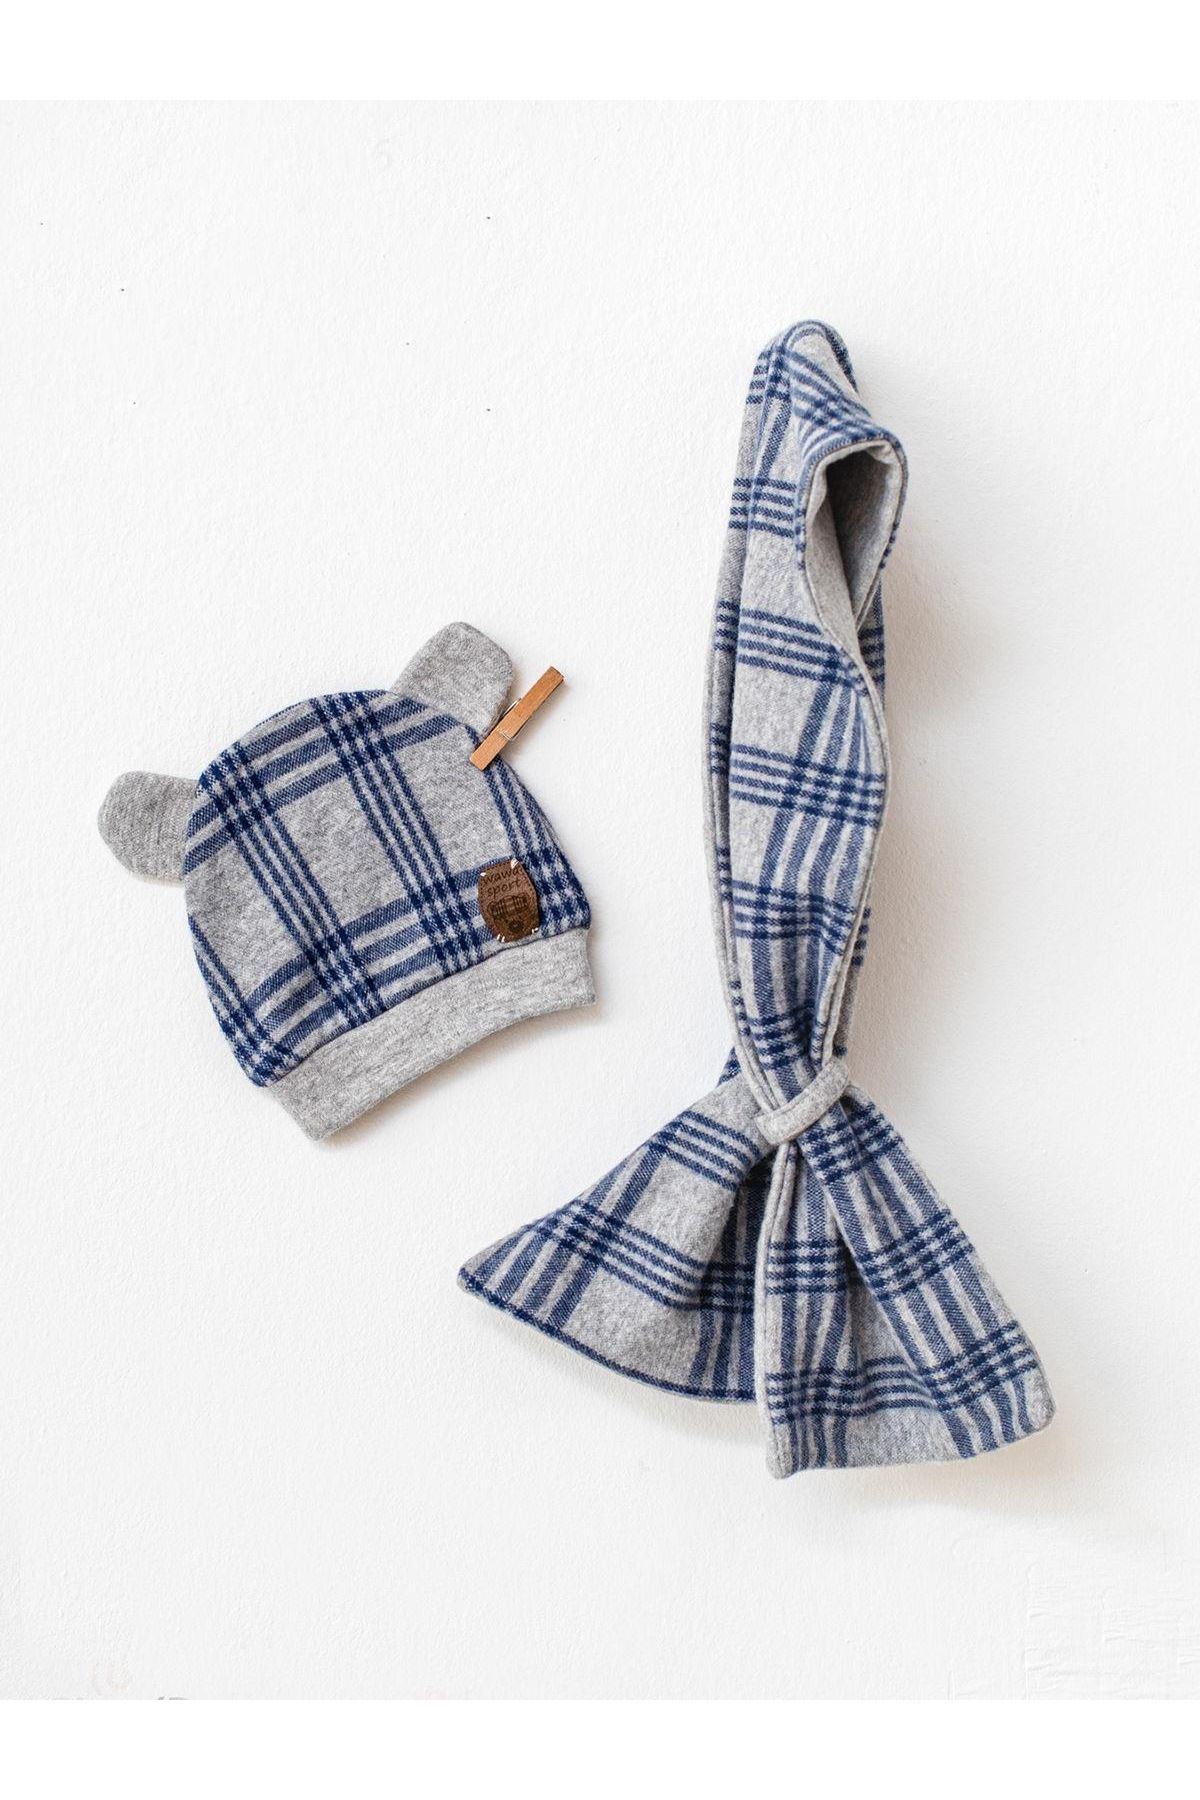 Andywawa AC21166 Awesome Bebek Şapka Atkı Seti NAVY